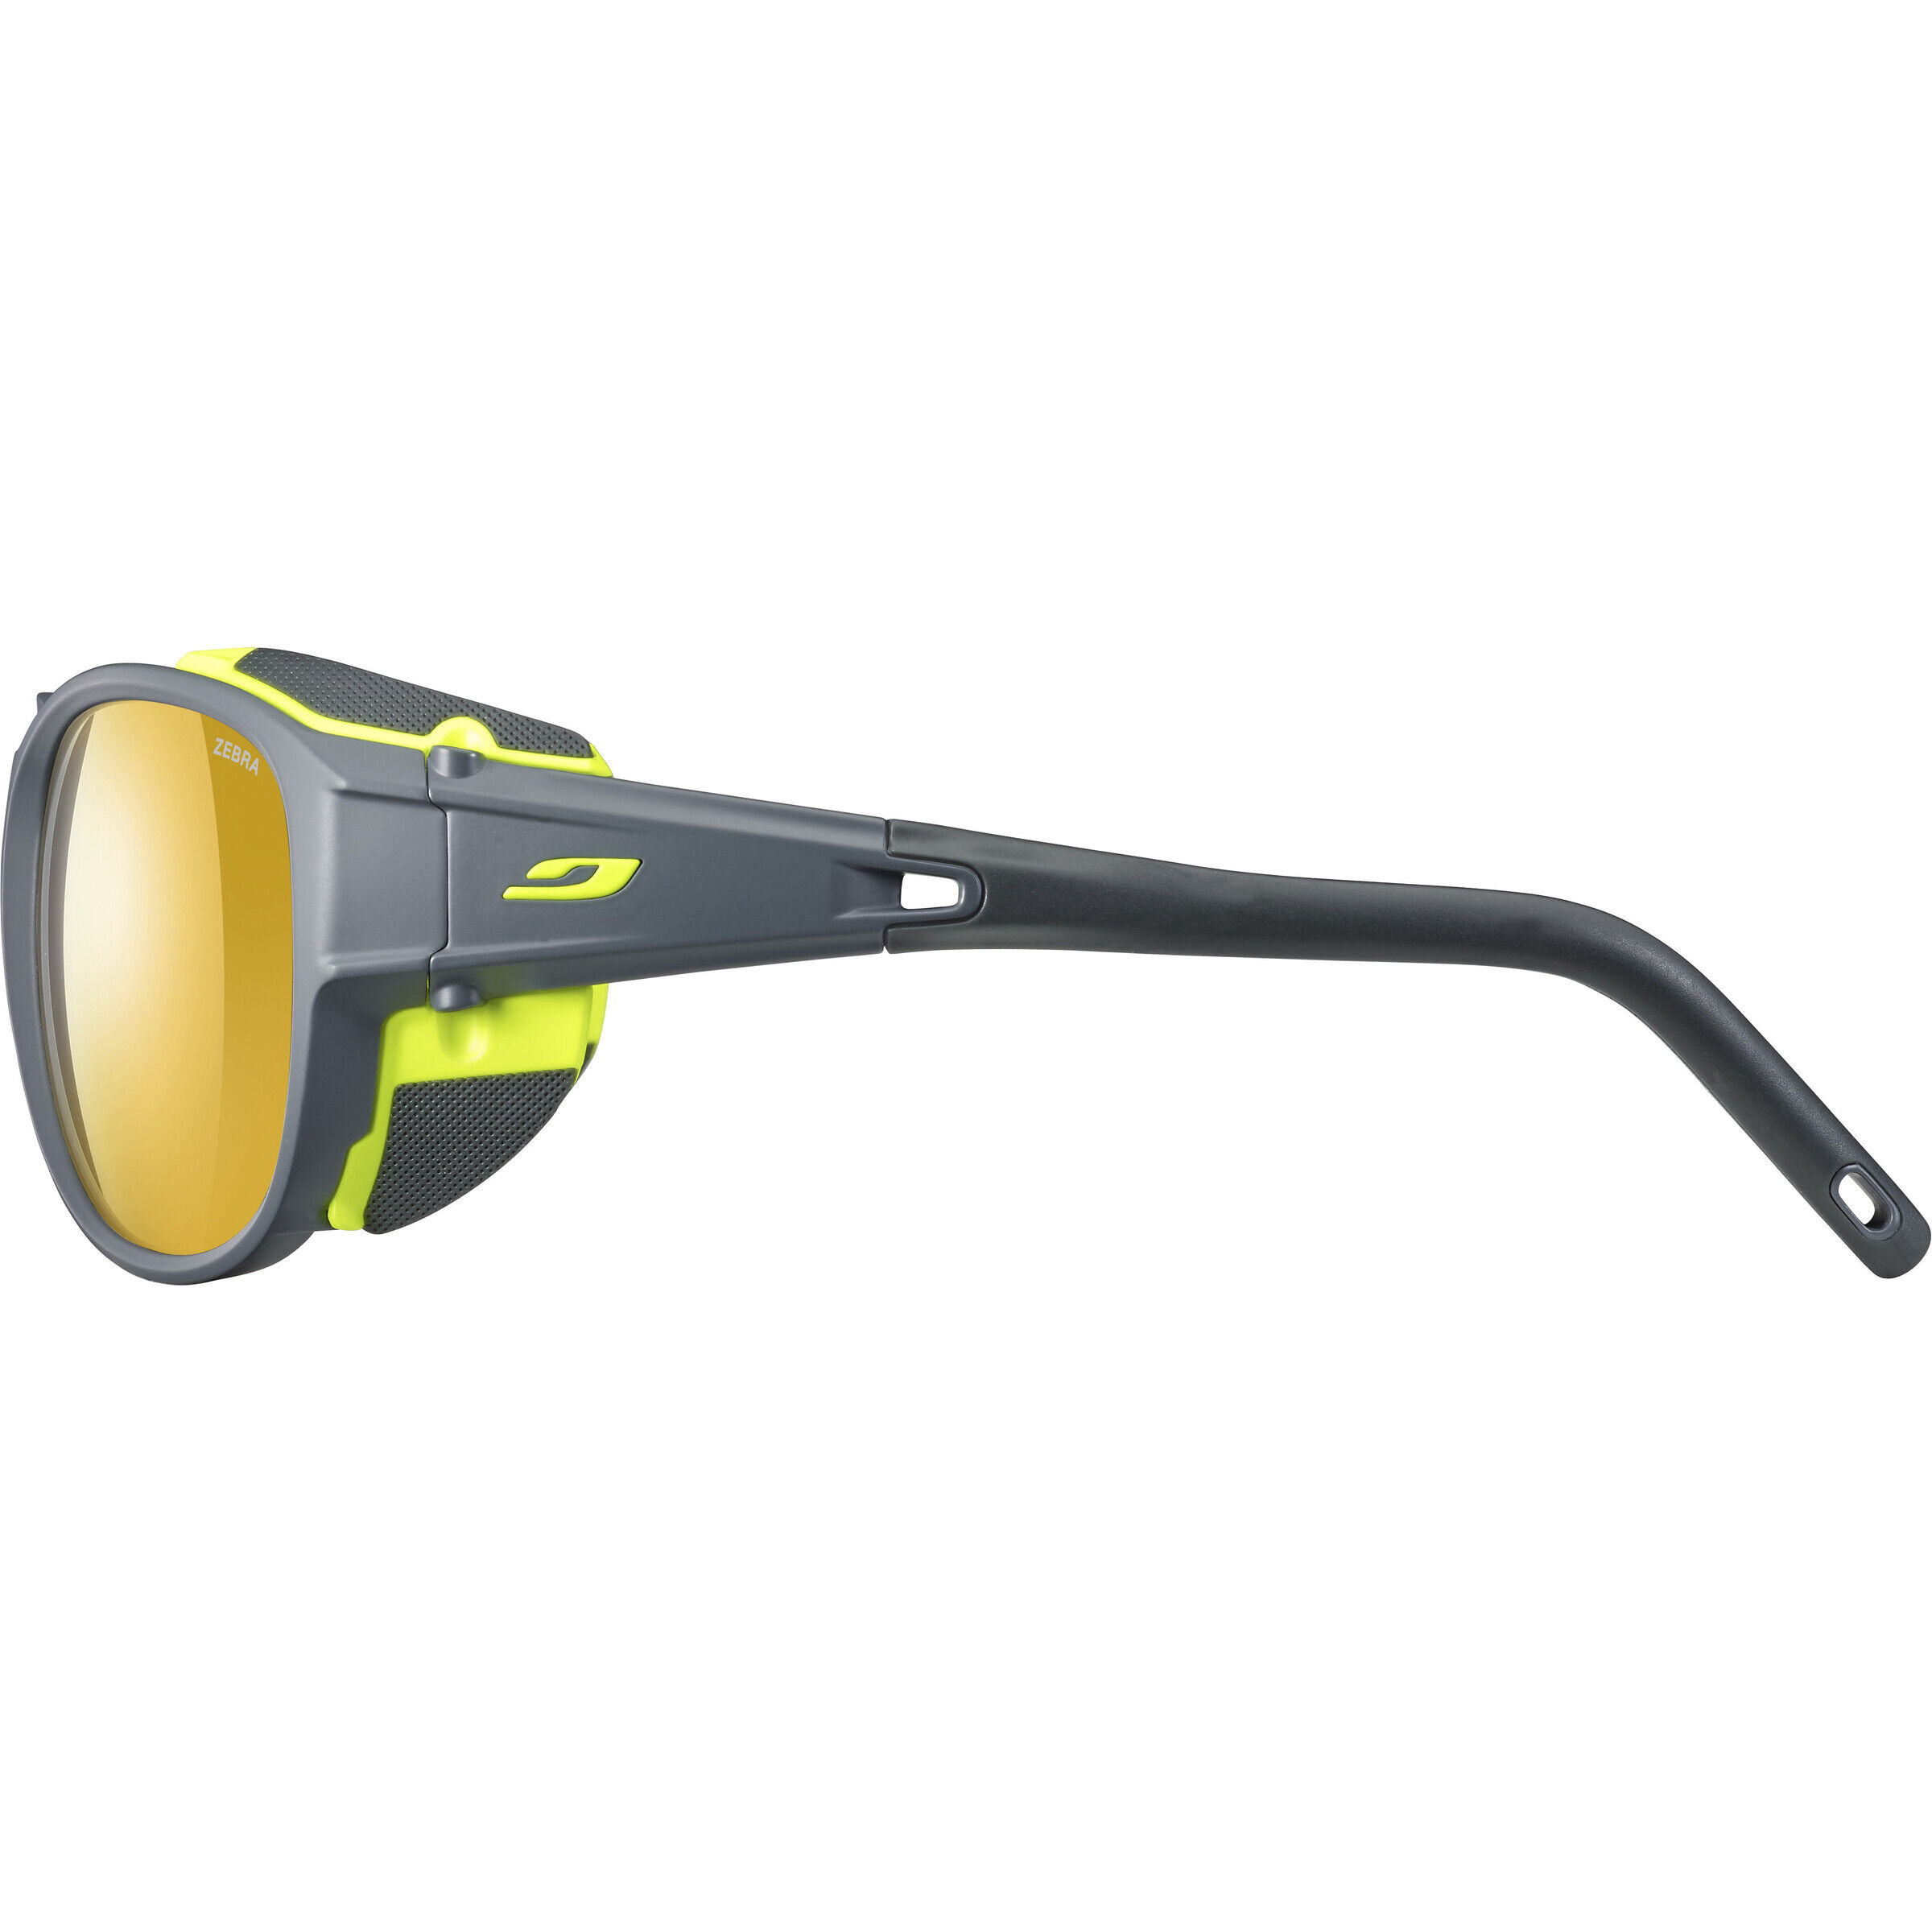 Julbo Explr 2.0 Zebra Sunglasses matt graygreen yellowbrown